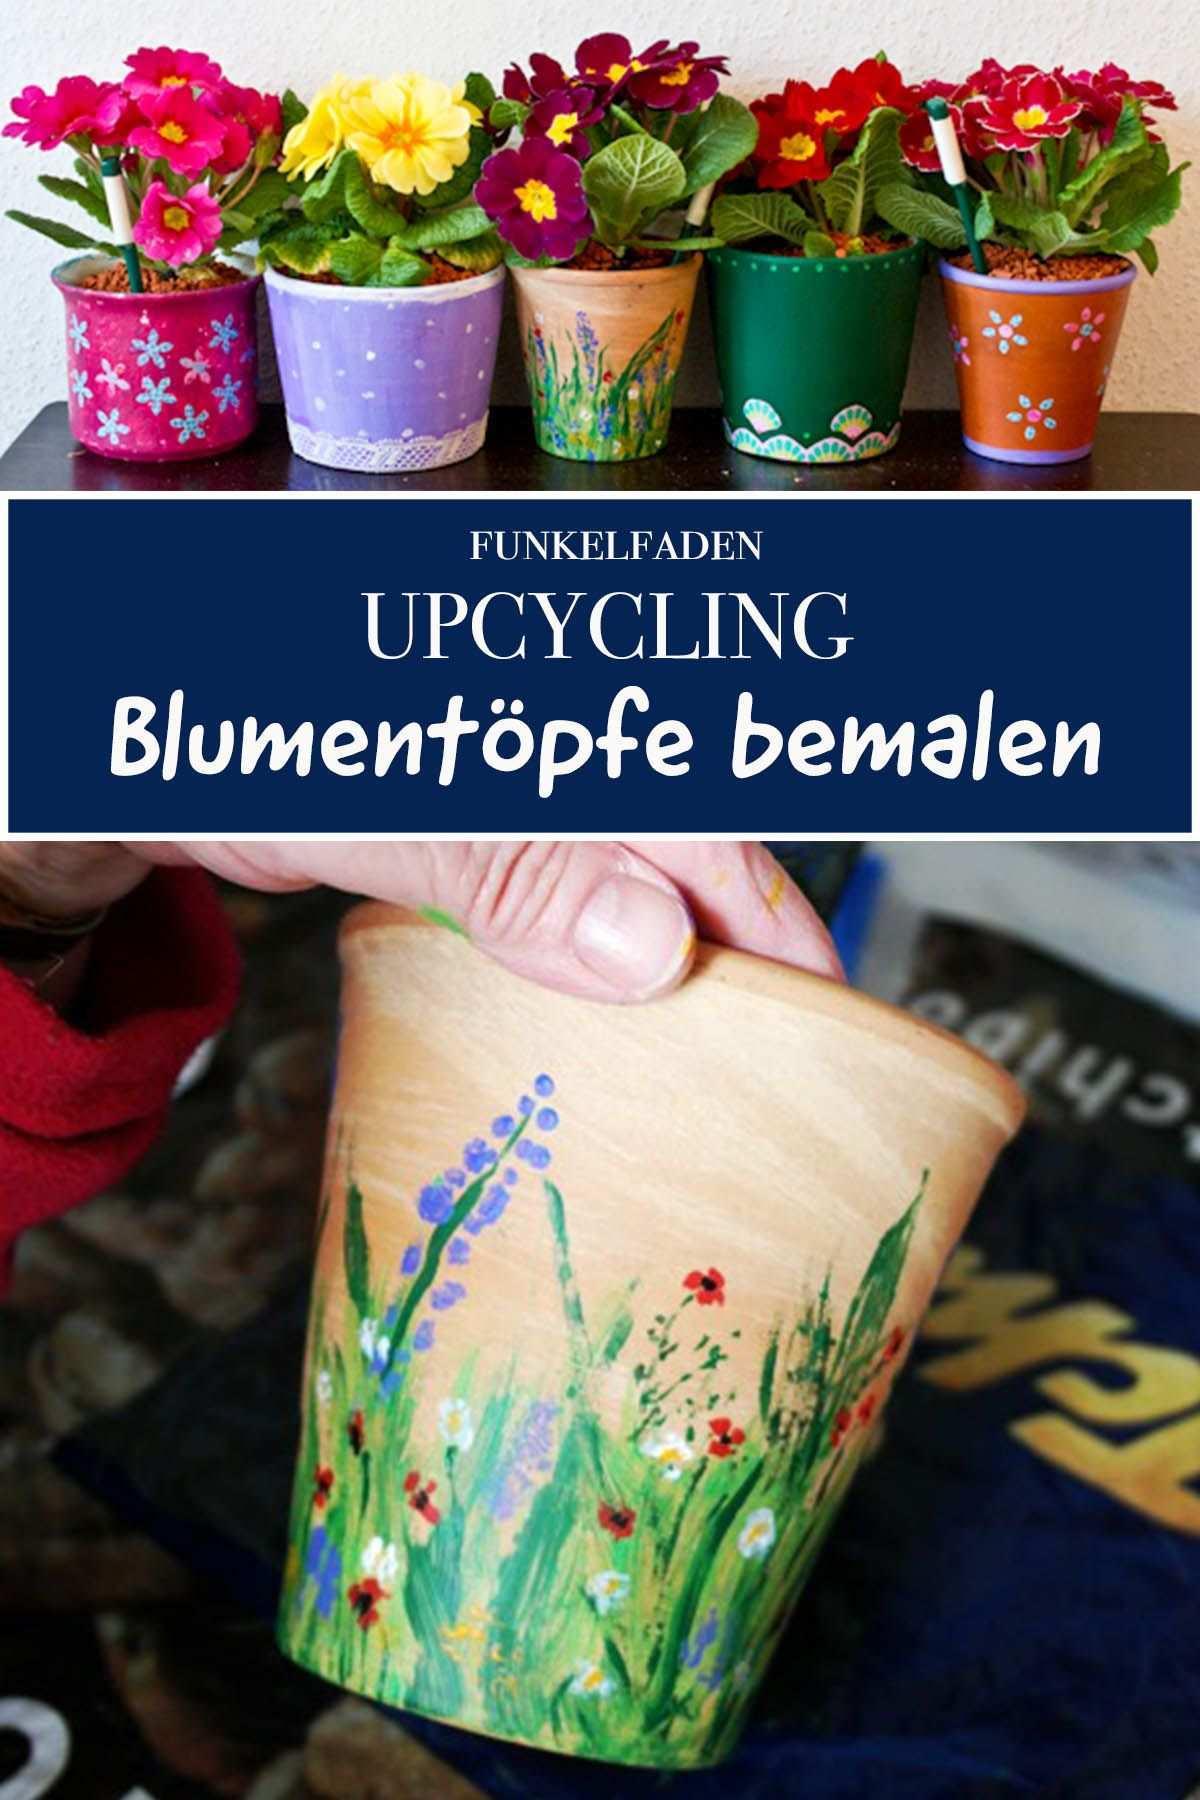 Alte Blumentopfe Bemalen Upcycling Fur Blumentopfe Diy Blumentopfe Bemalen Pflanzen Mit Kindern Blumentopf